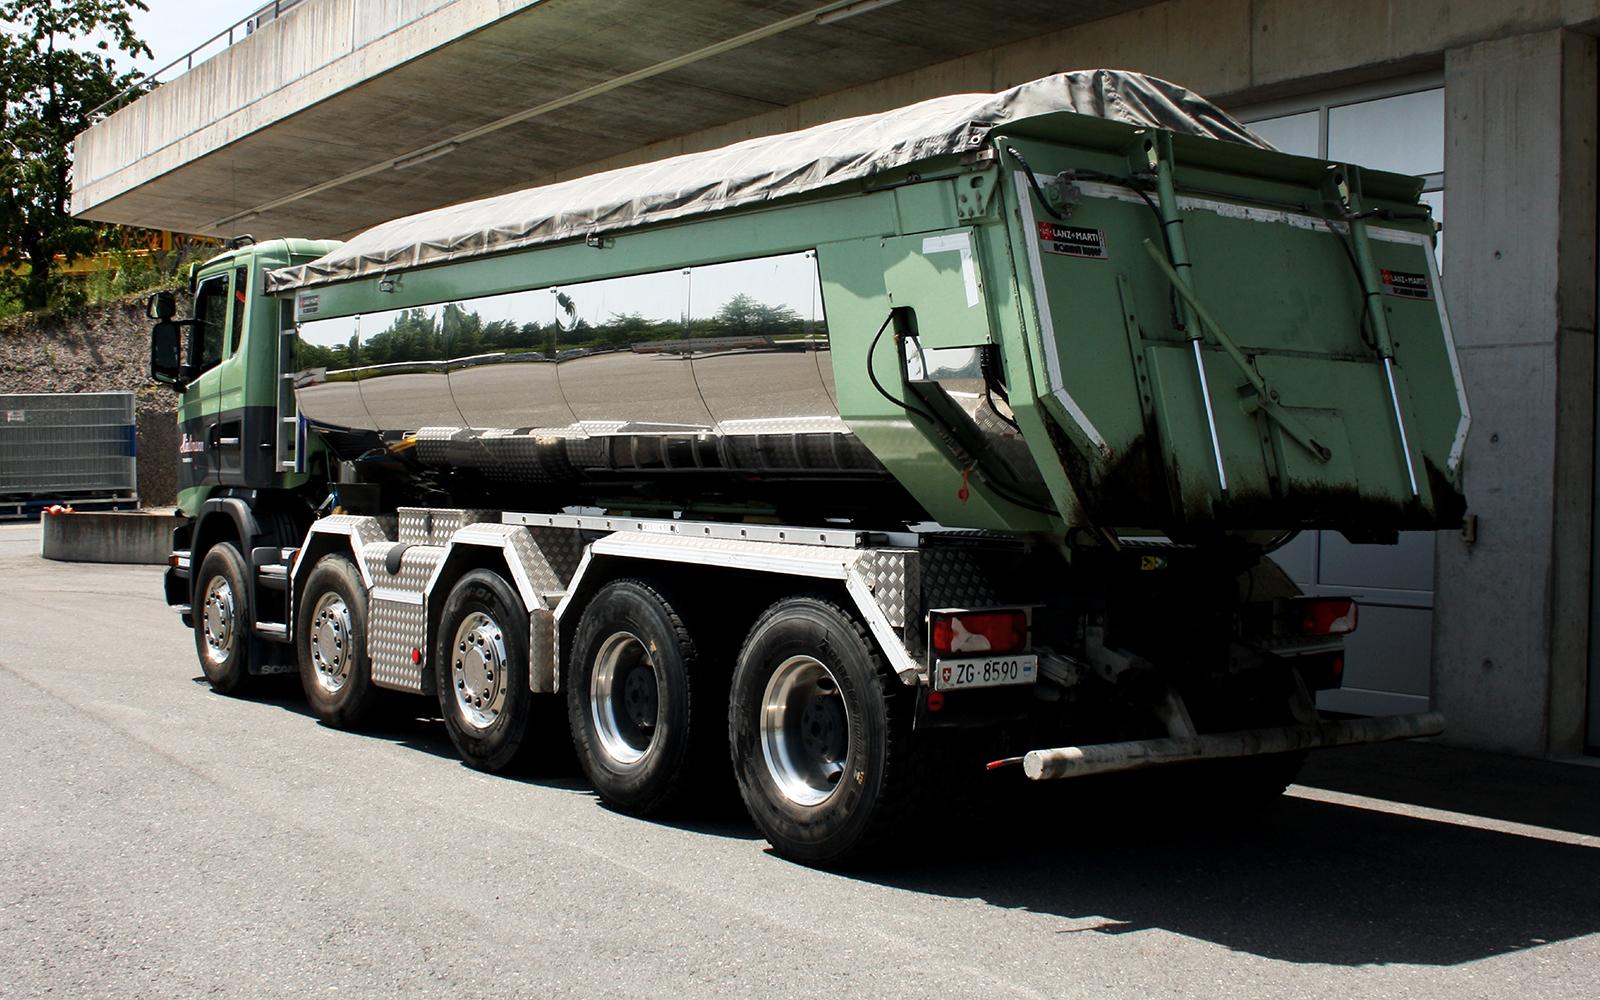 Huerlimann-Scania5AKT_1600x1000px_2